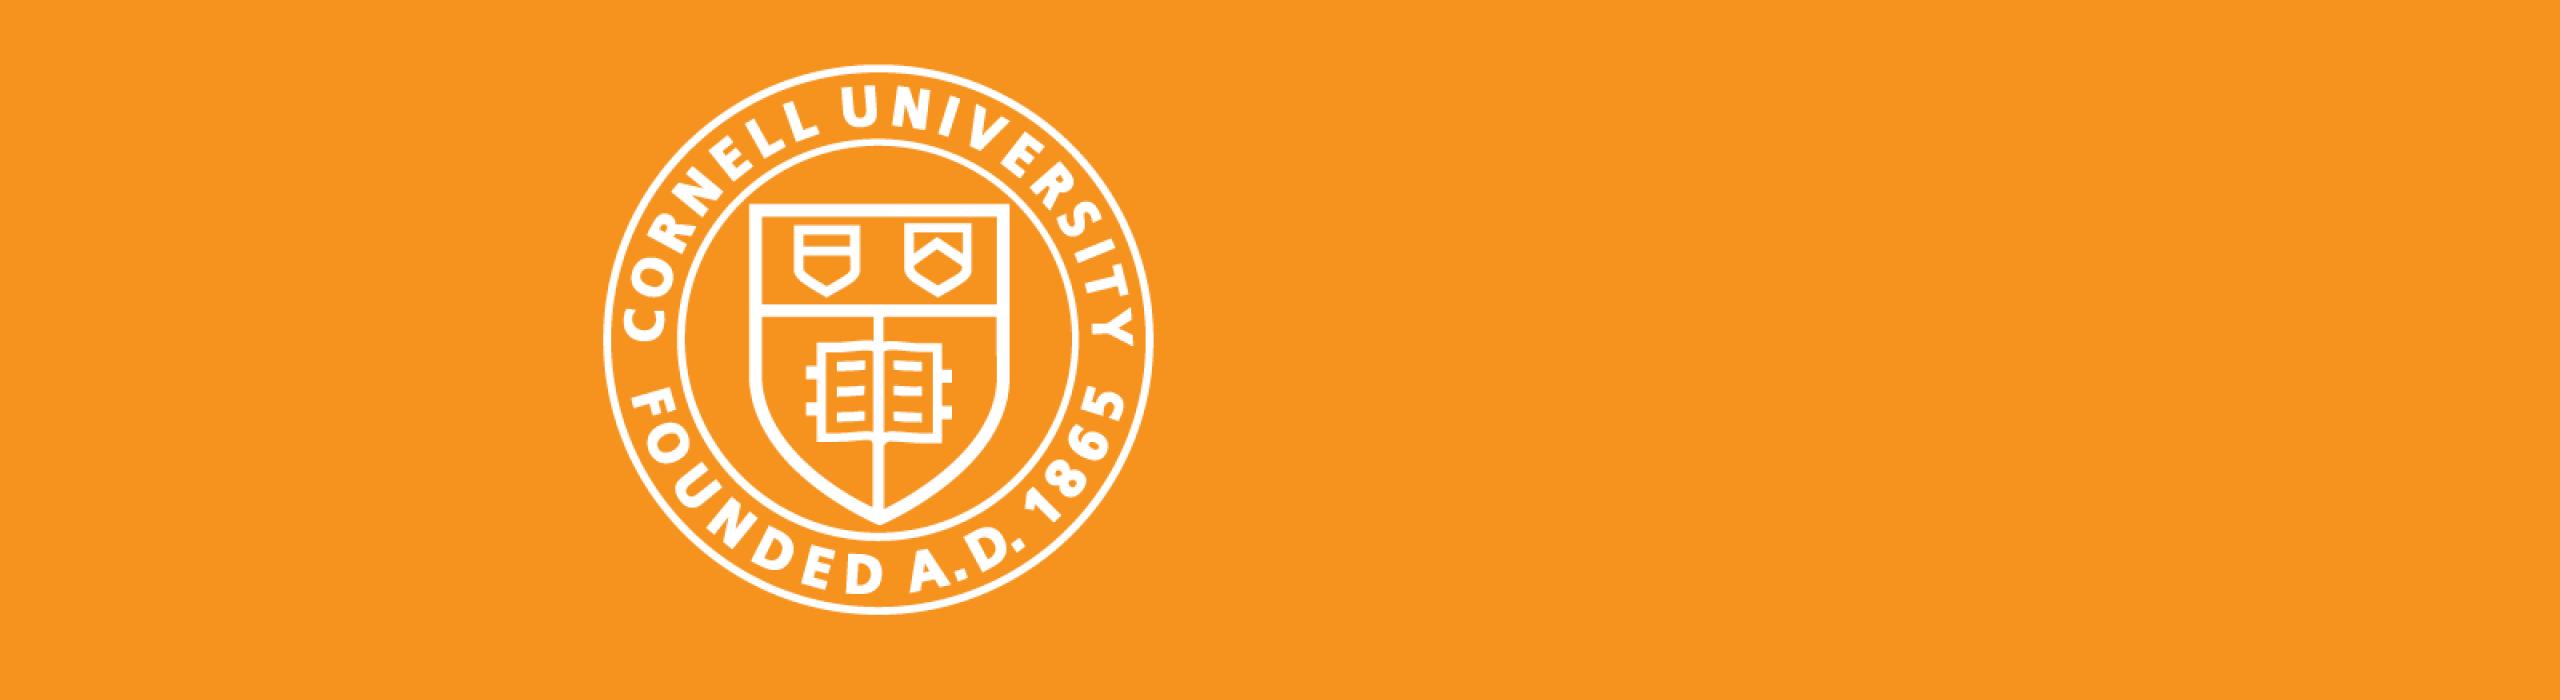 Cornell Banner in CIS orange